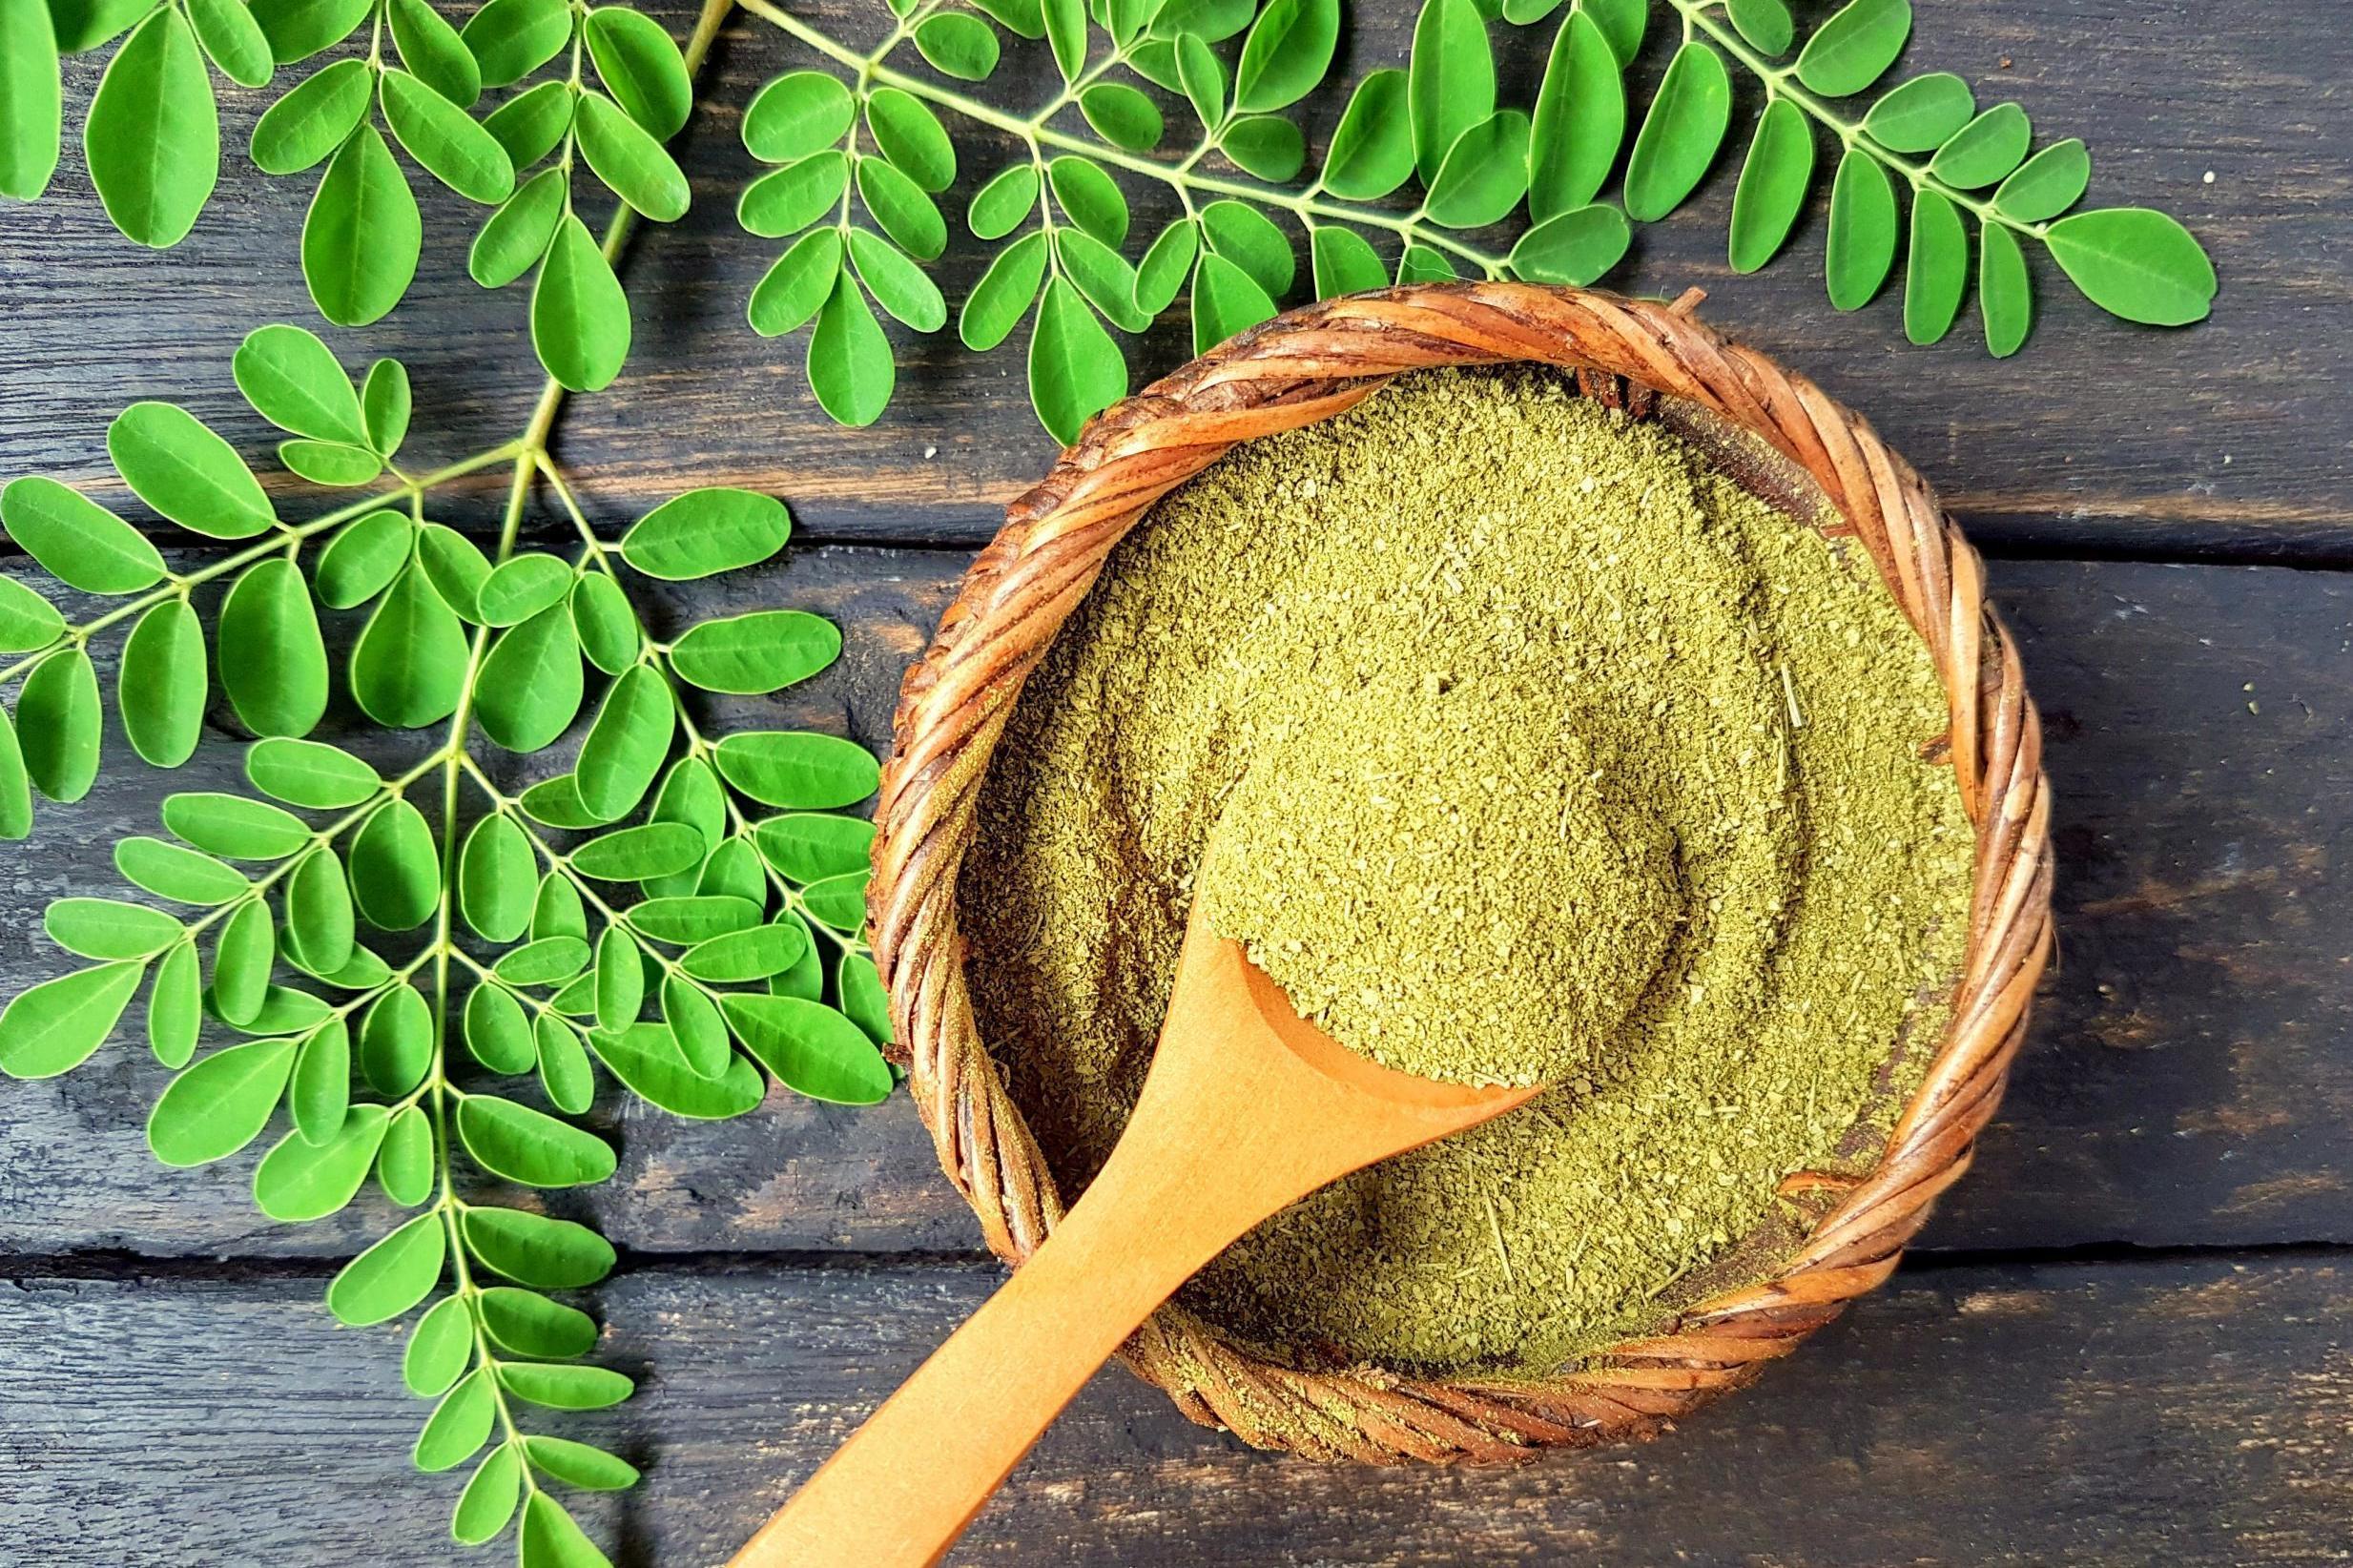 Moringa: The new superfood that's trending among wellness types